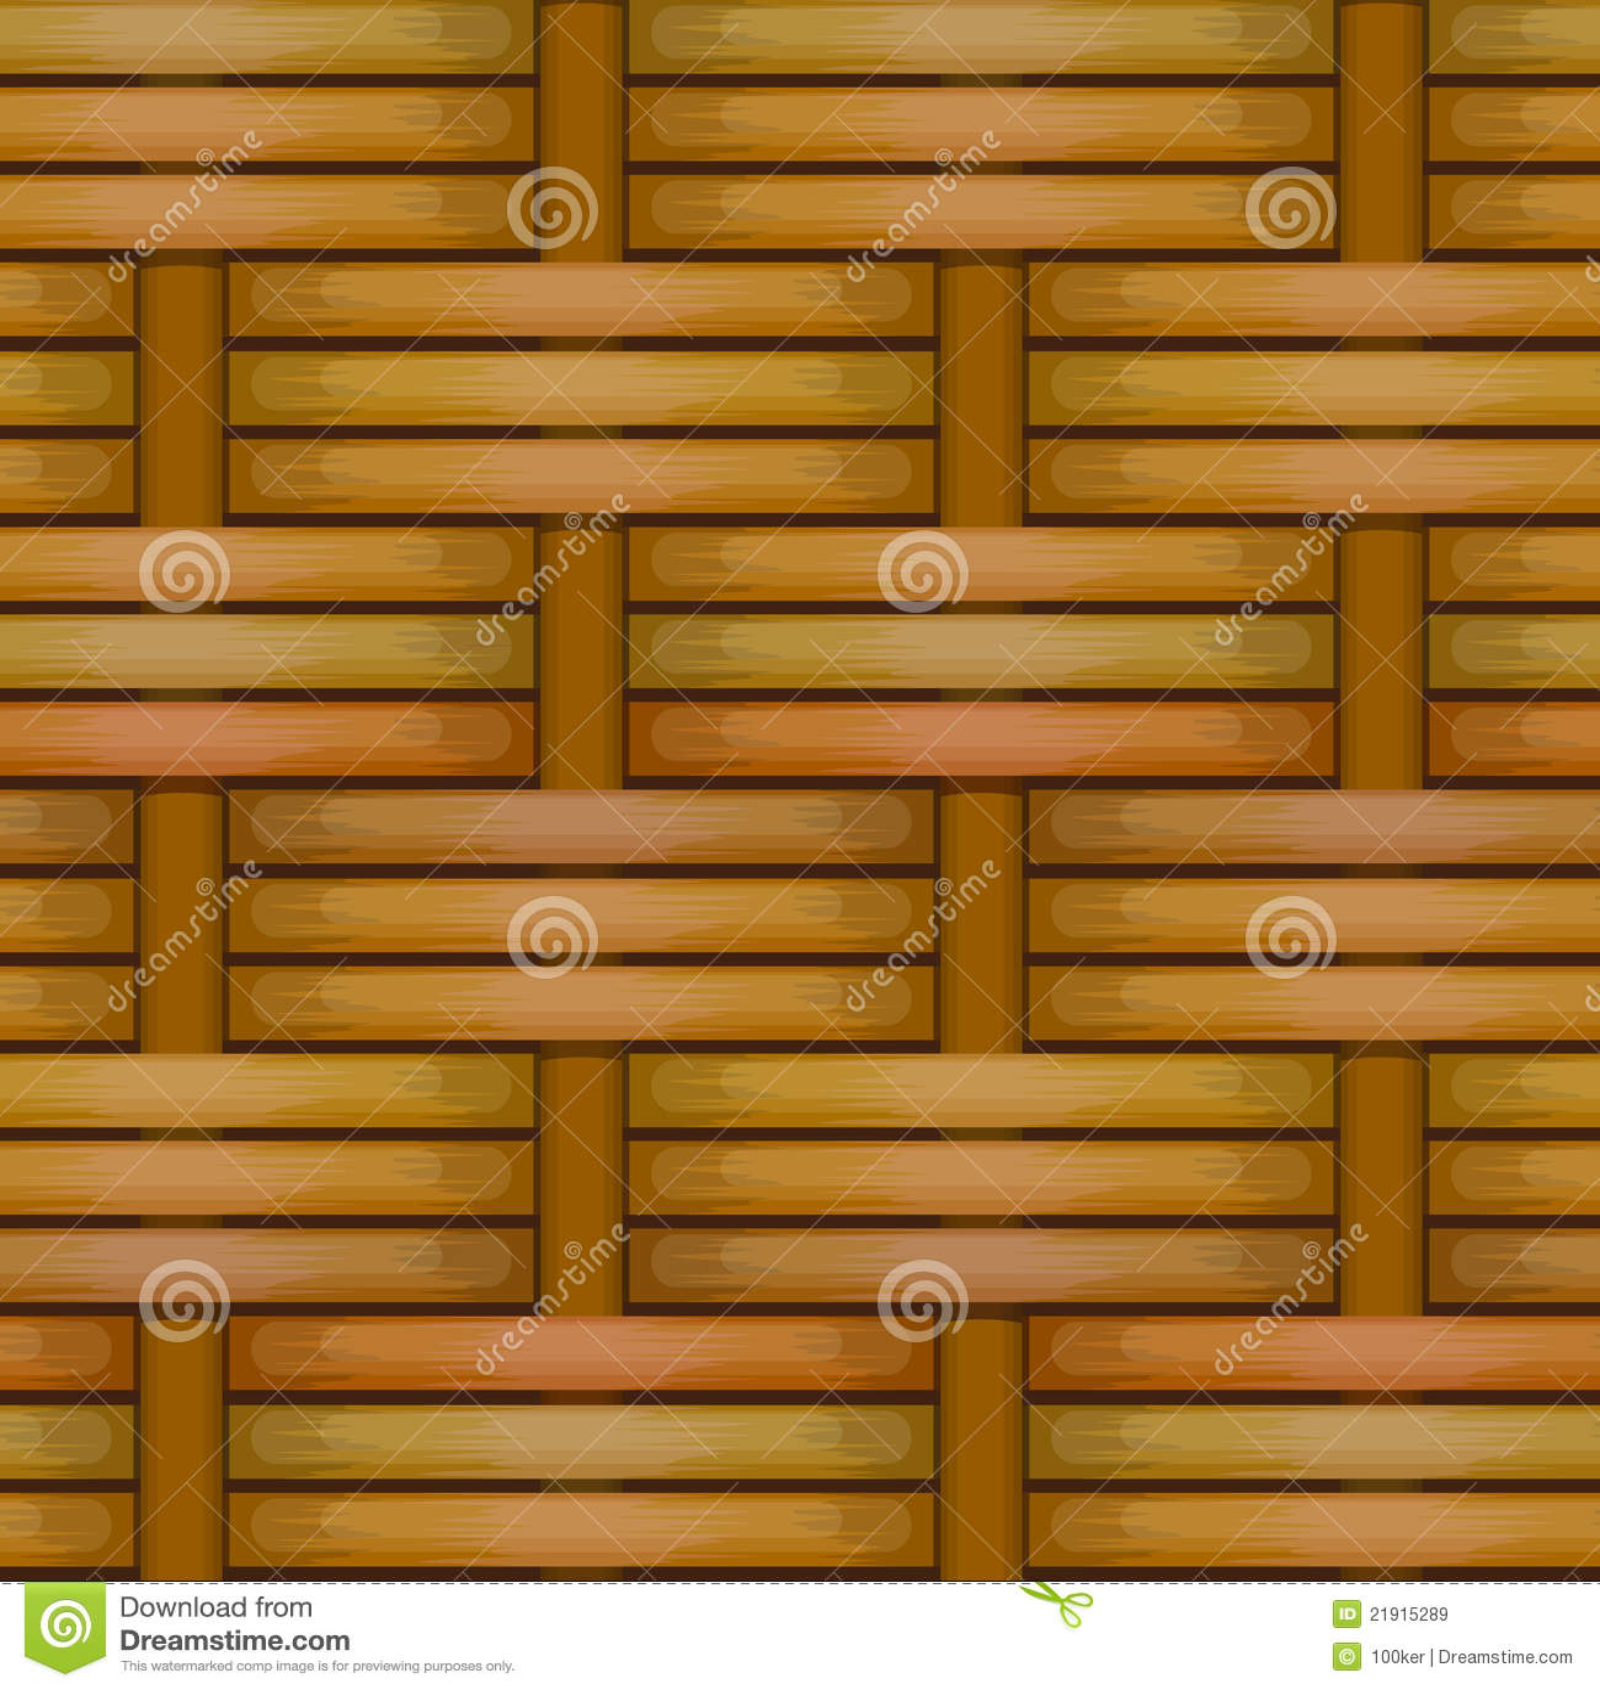 Free Basket Weaving Patterns Pictures : Wicker basket weaving pattern seamless texture stock